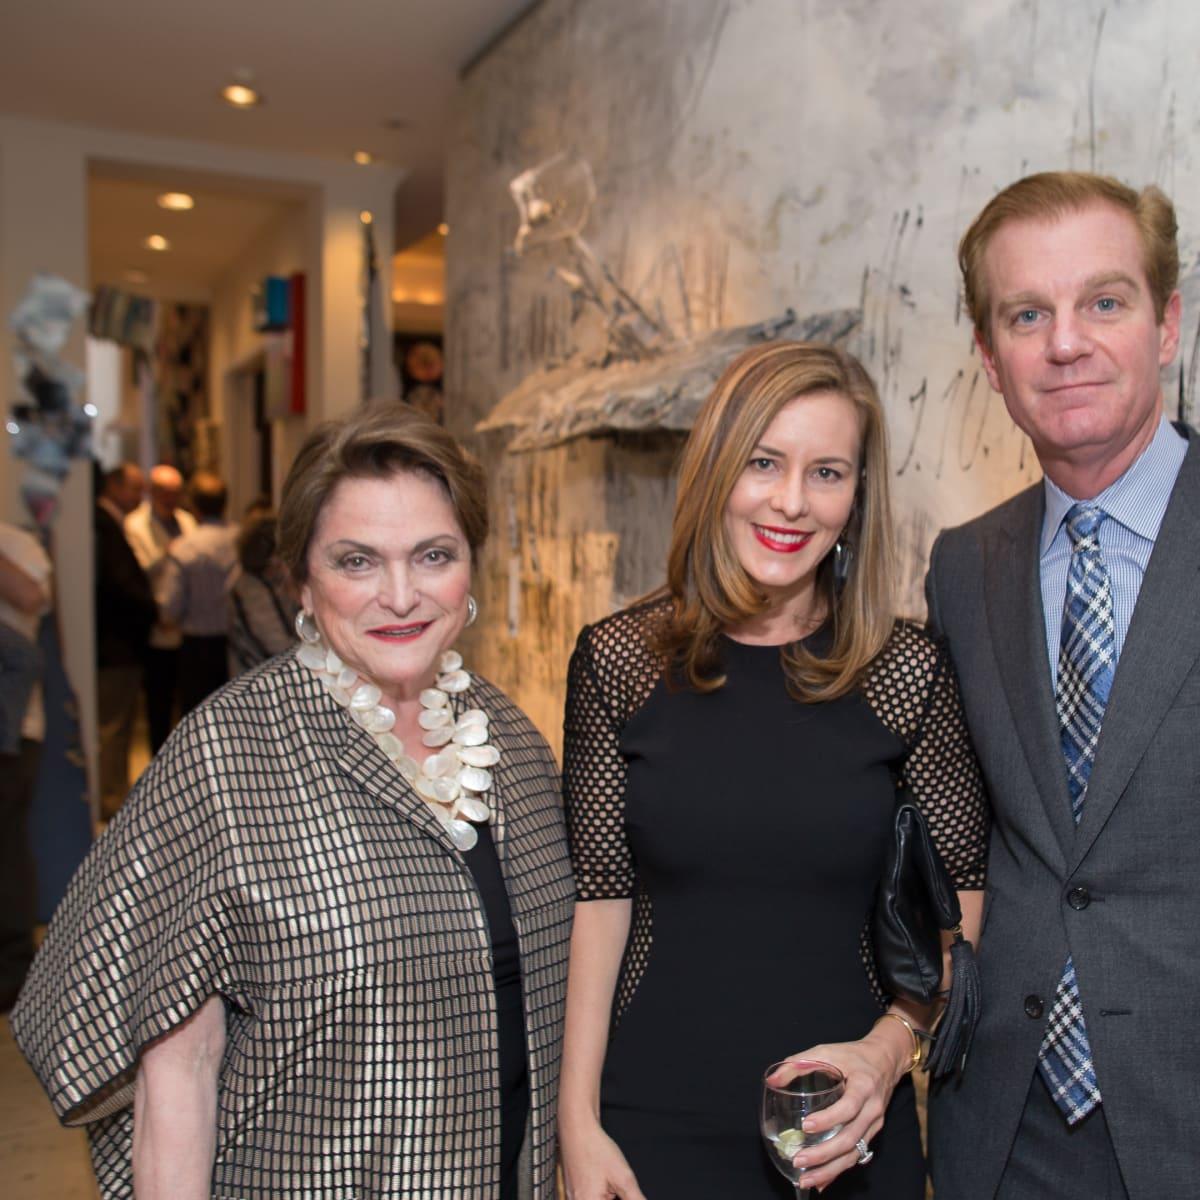 News, Shelby, Fine Art Fair Kick-off, Sept. 2015, Beth Wolff, Jennifer Dolman, Steve Dolman